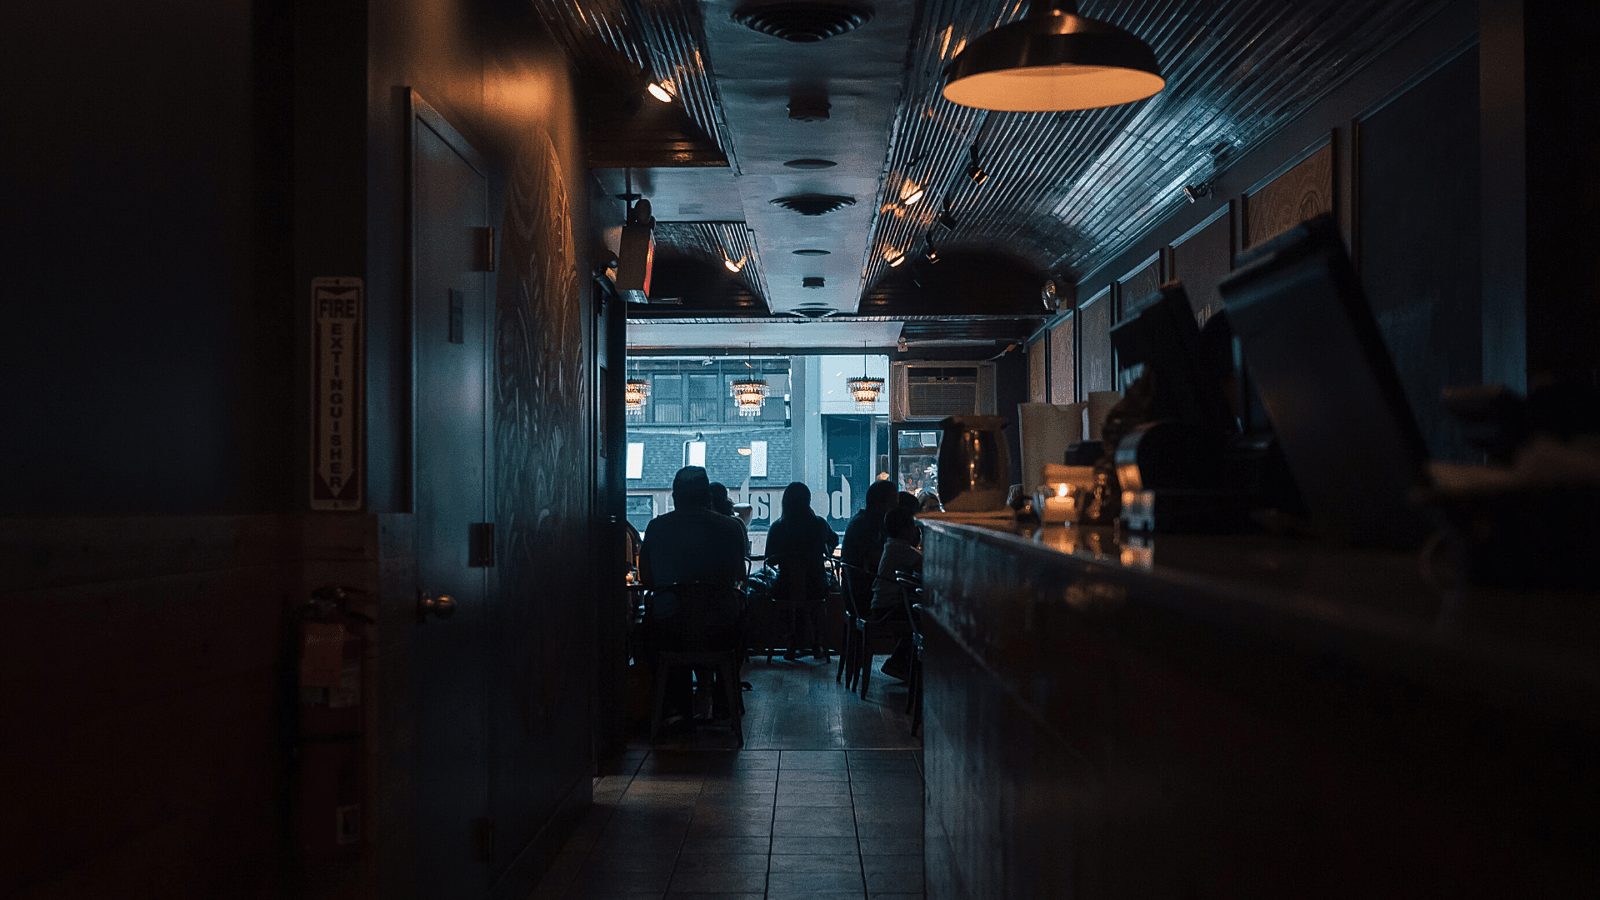 Challenges Black restaurateur